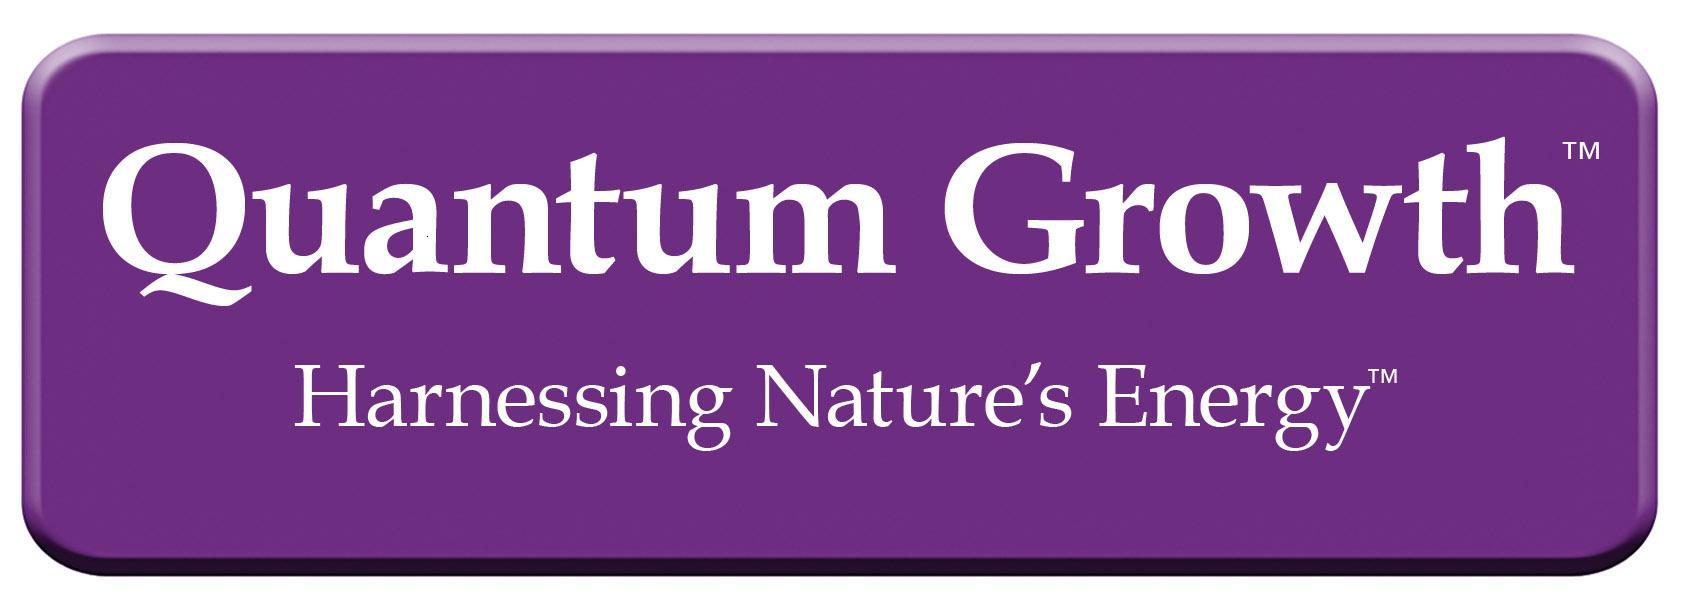 Karl Manges Quantum Logo